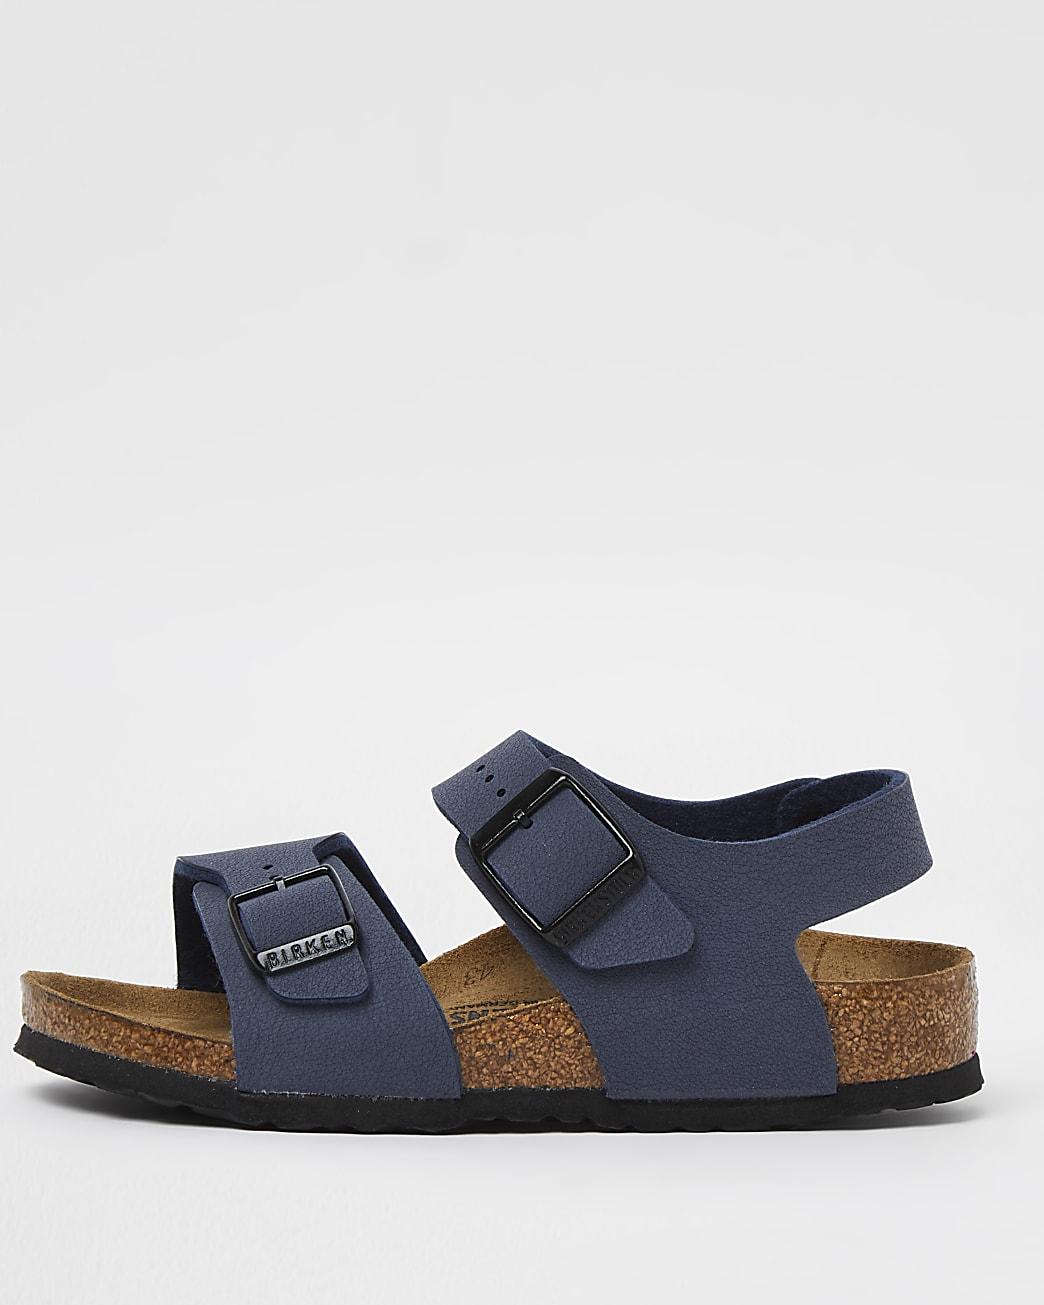 Boys navy Birkenstock double strap sandals